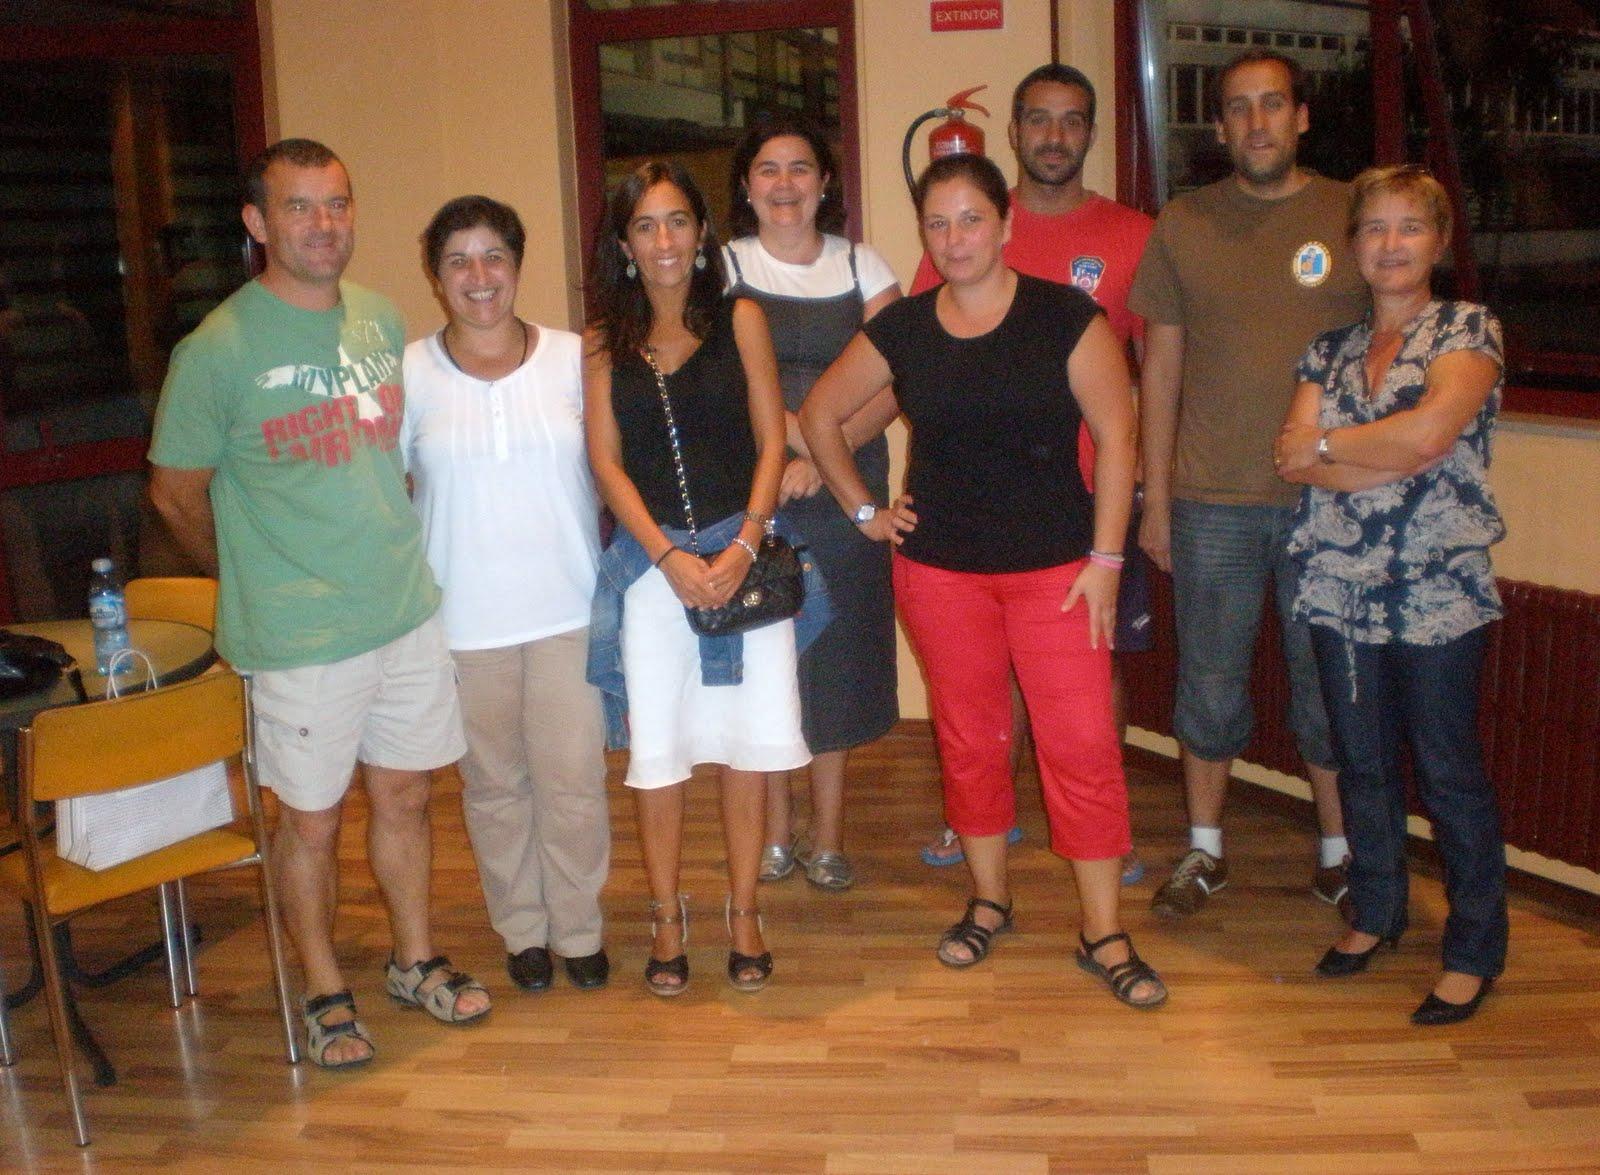 Waterpolo pontevedra blog septiembre 2010 for Piscina del carmen vigo